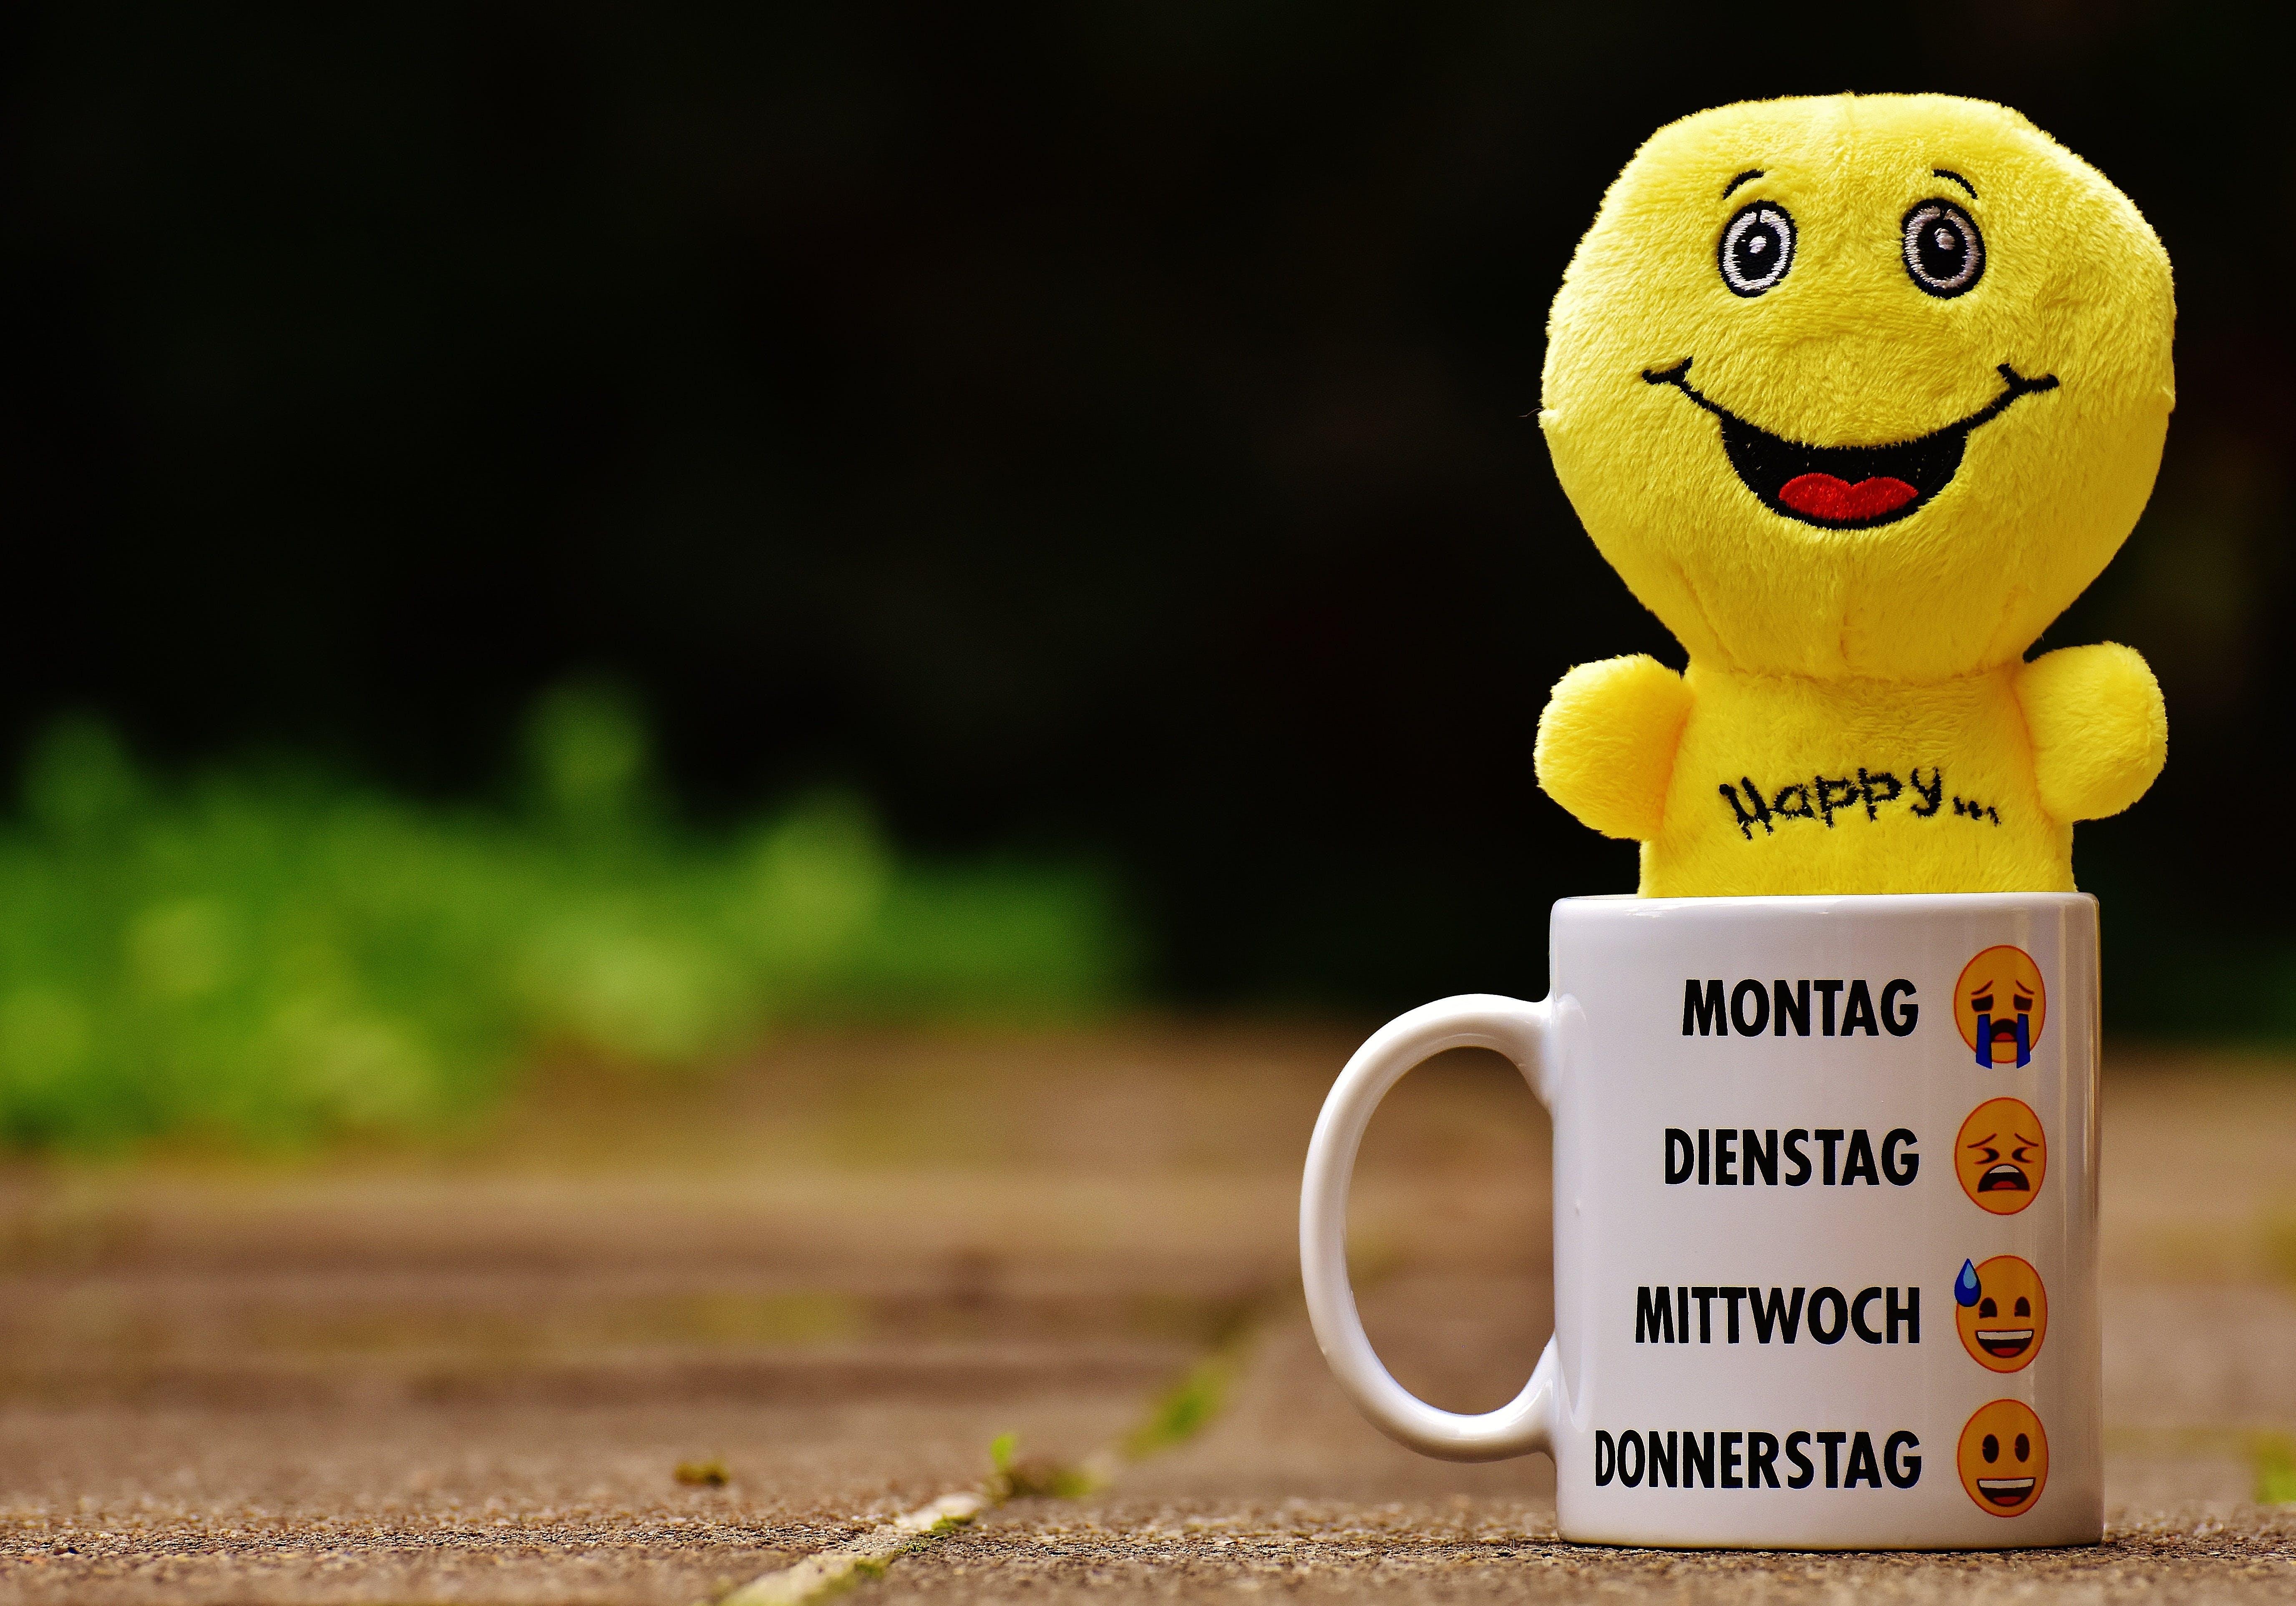 White Ceramic Mug With Yellow Plush Toy on It